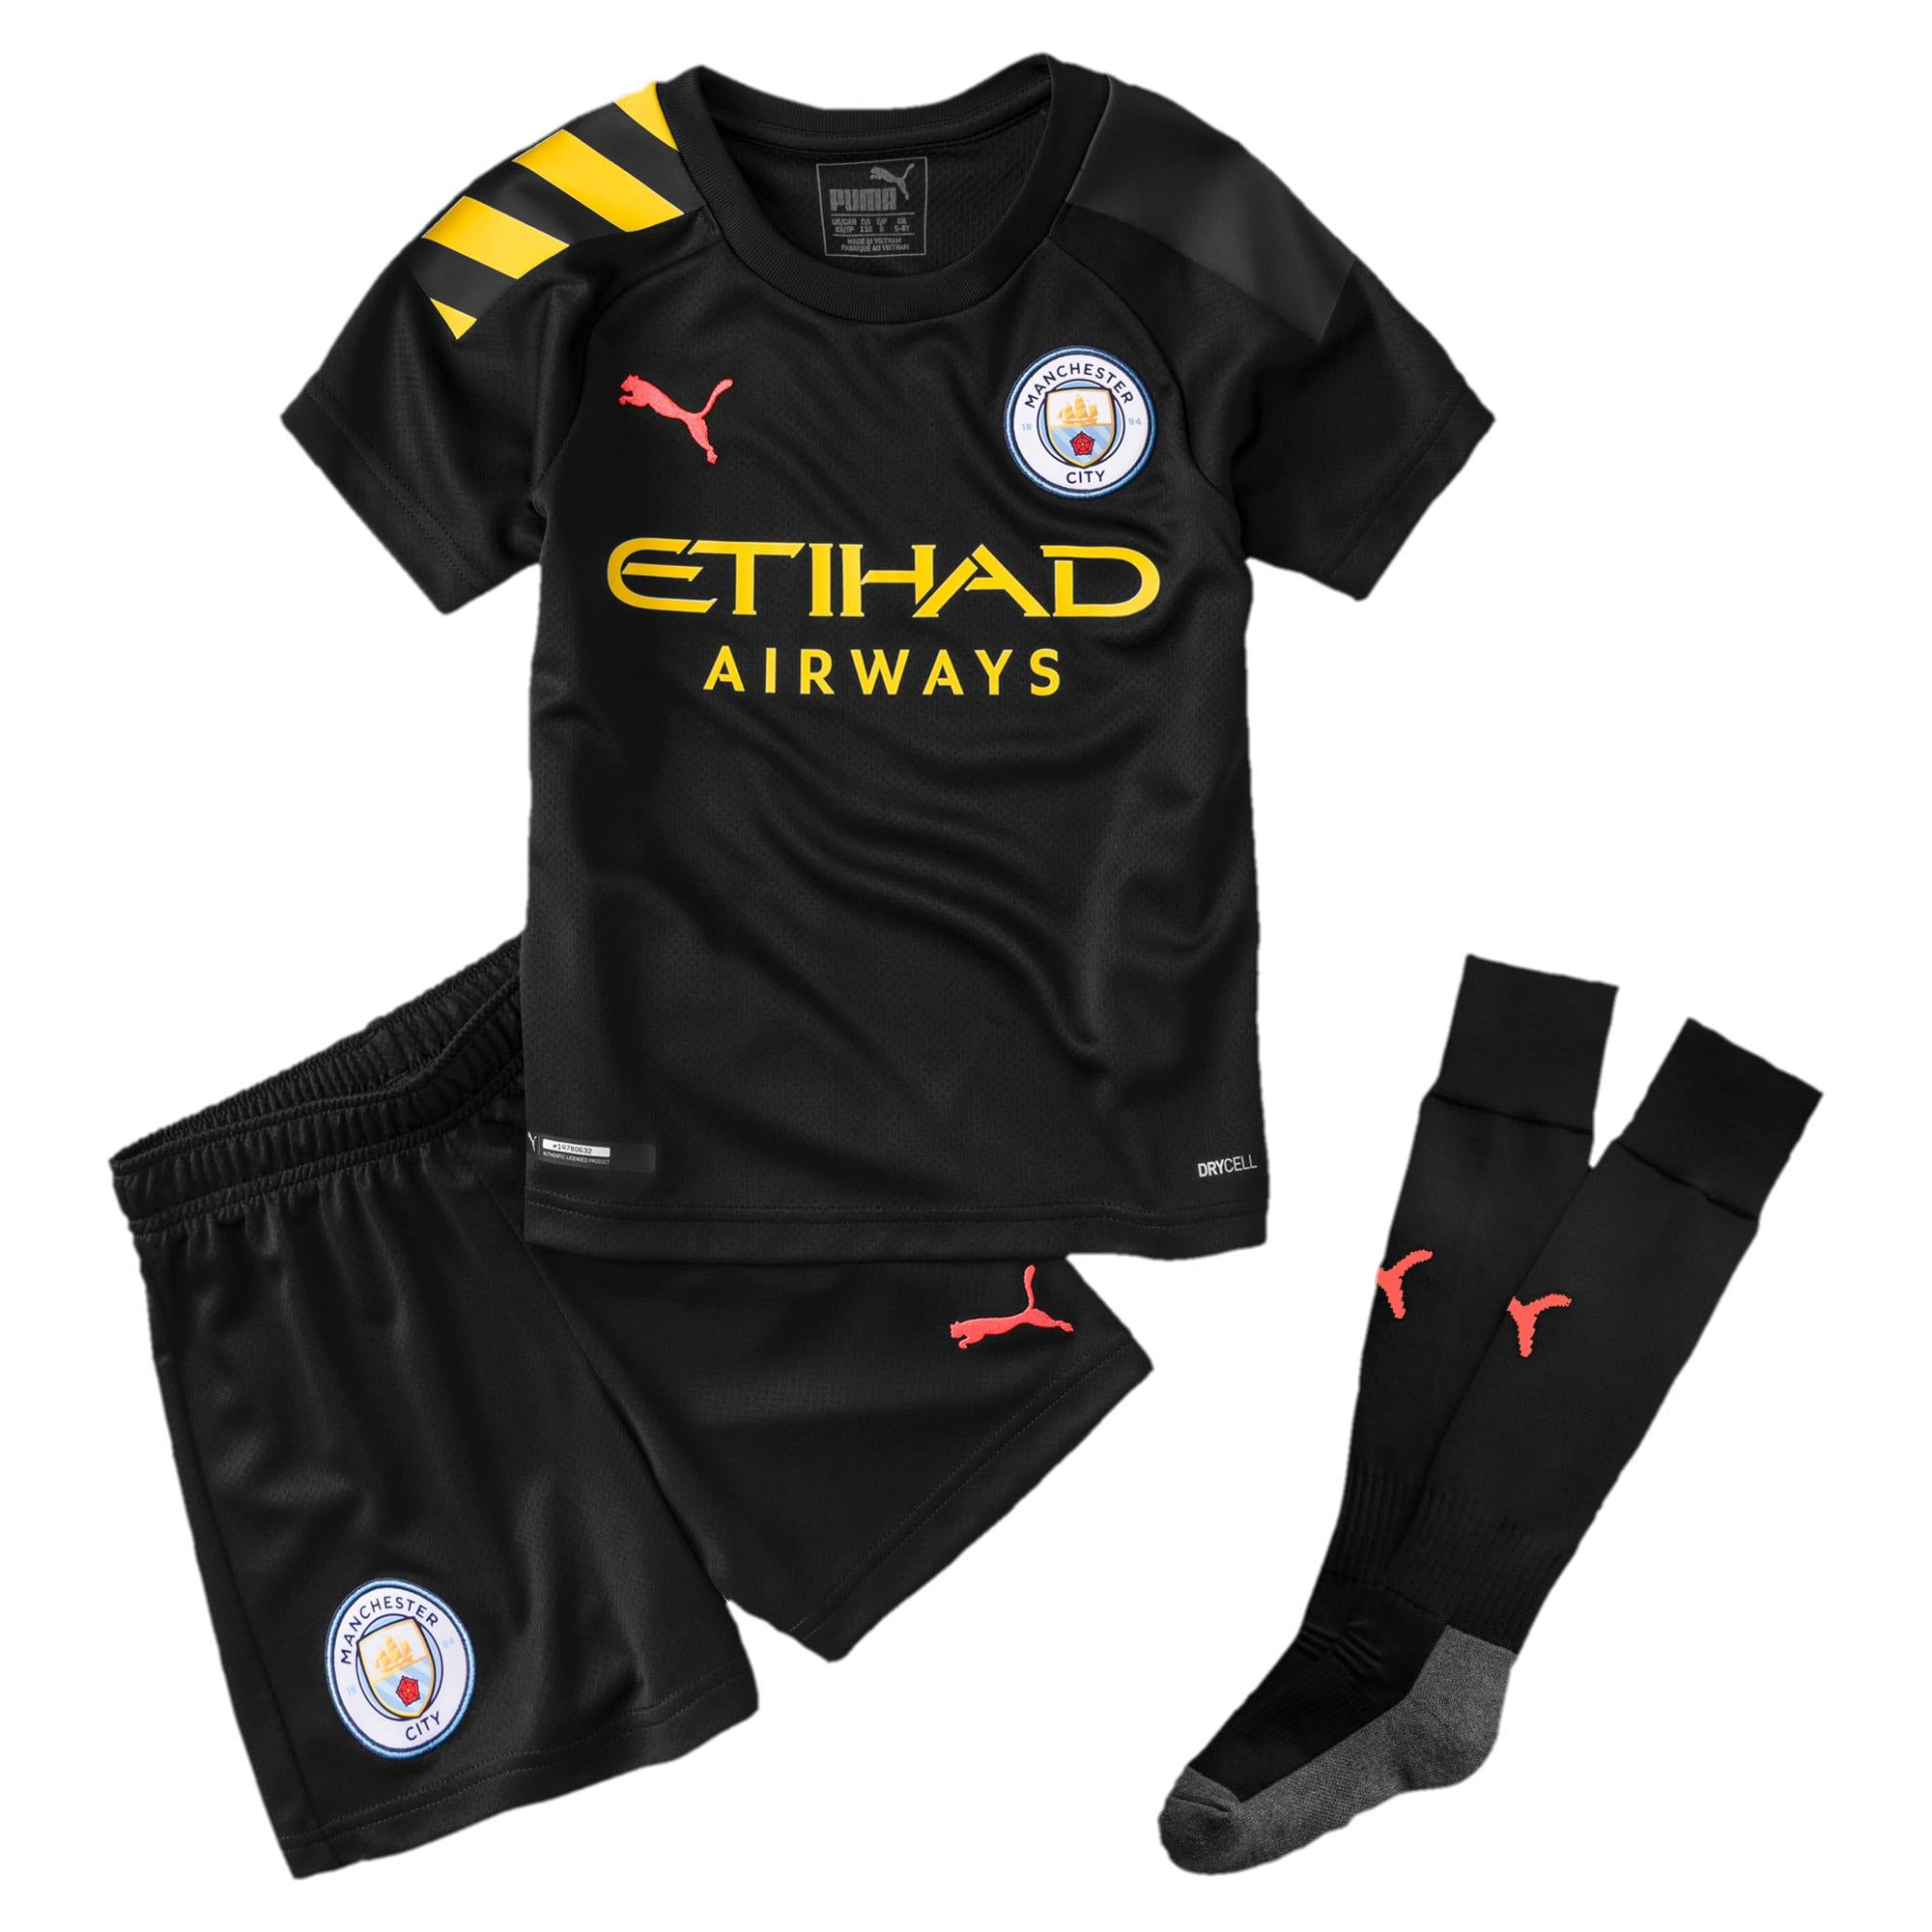 huge selection of 0a4d9 d9d92 Man City Kids' Away Replica Mini Kit